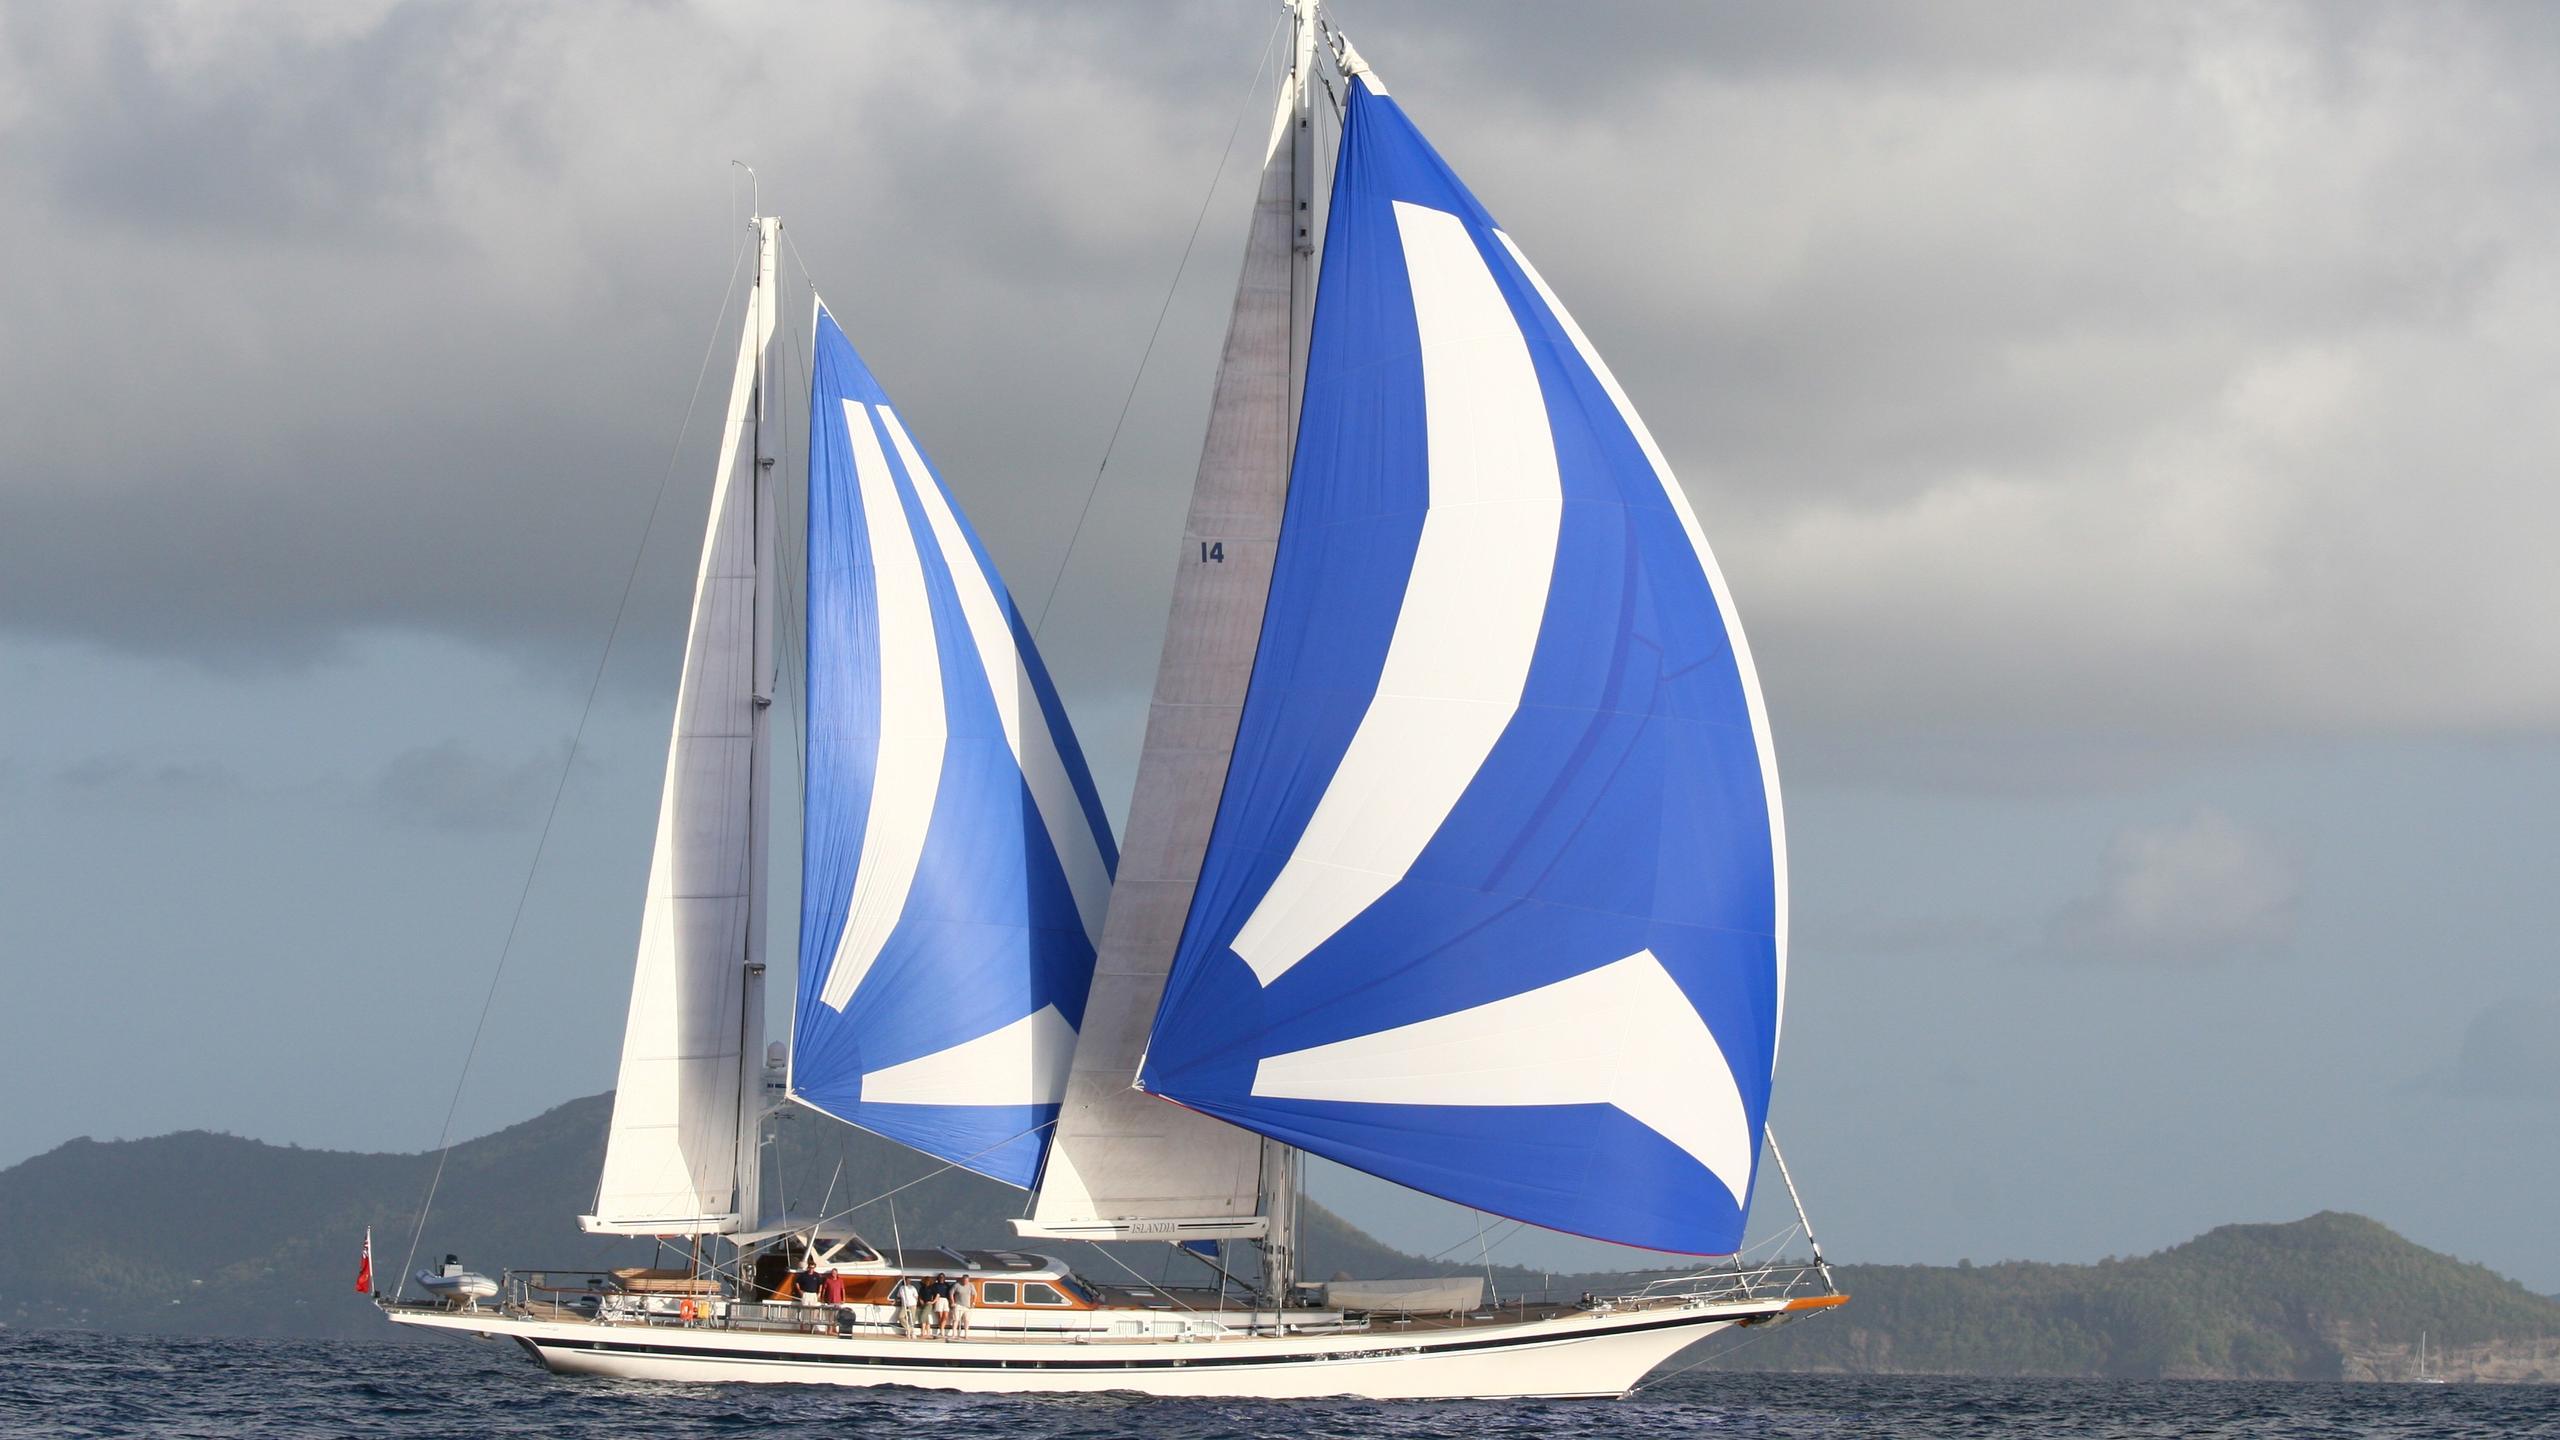 Islandia yacht